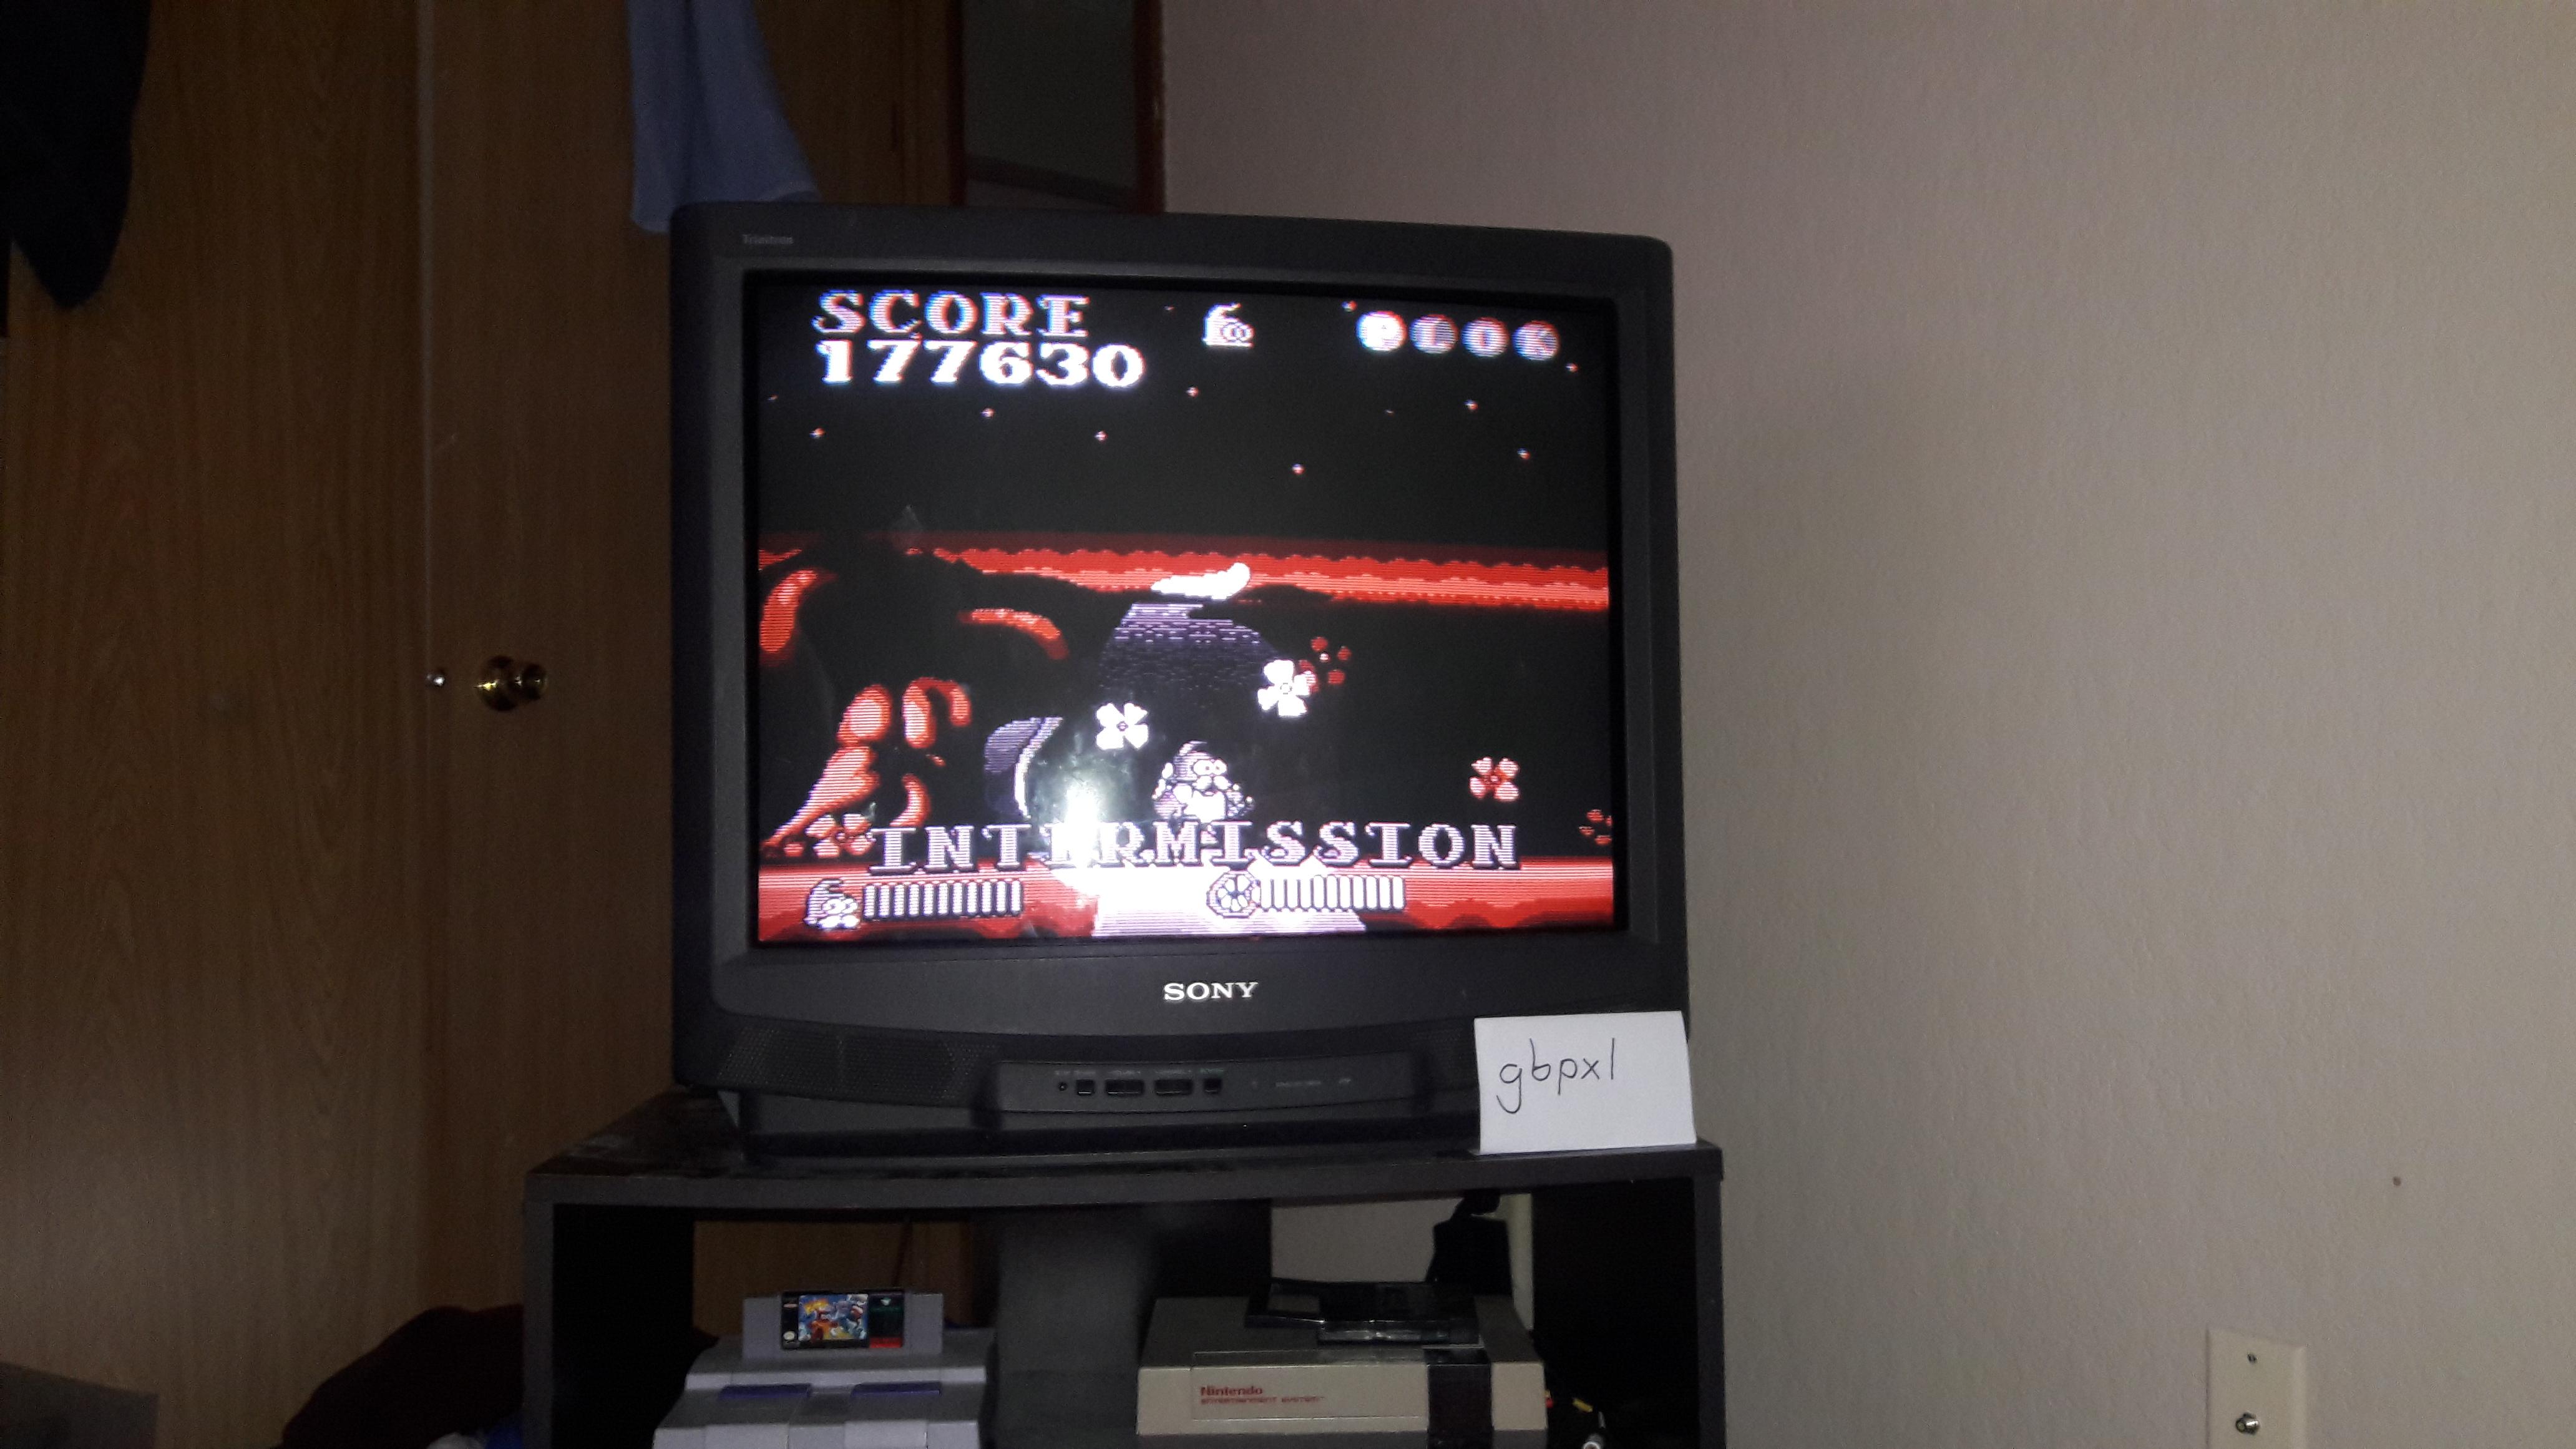 gbpxl: Plok (SNES/Super Famicom) 177,630 points on 2018-11-22 10:18:01